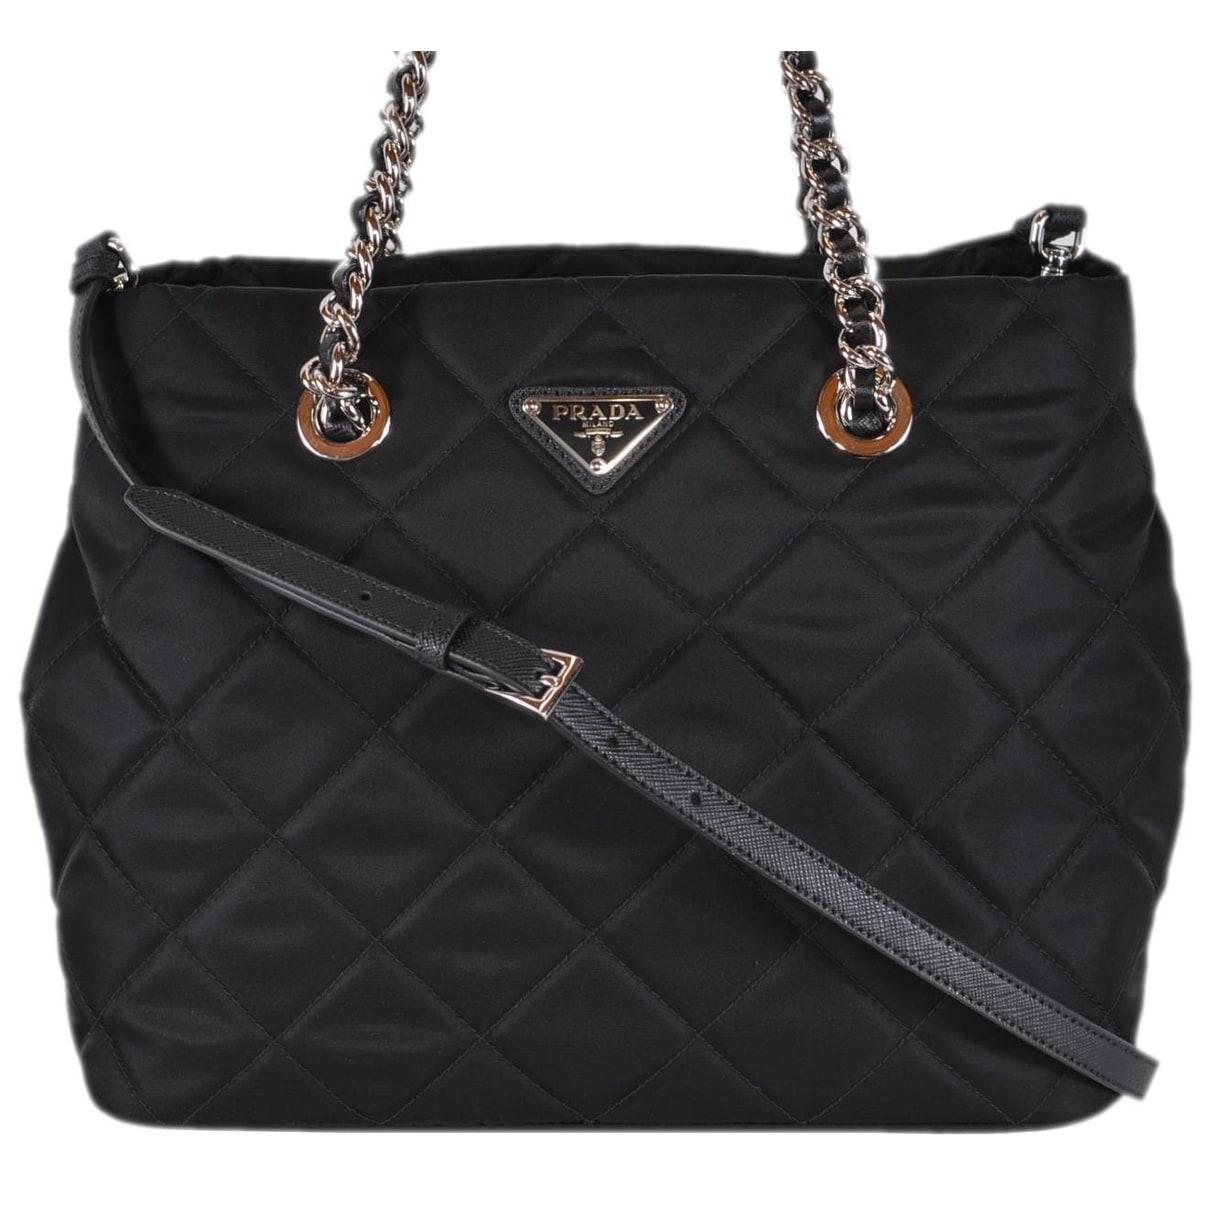 Prada Designer Handbags  2956fd7b2b26f